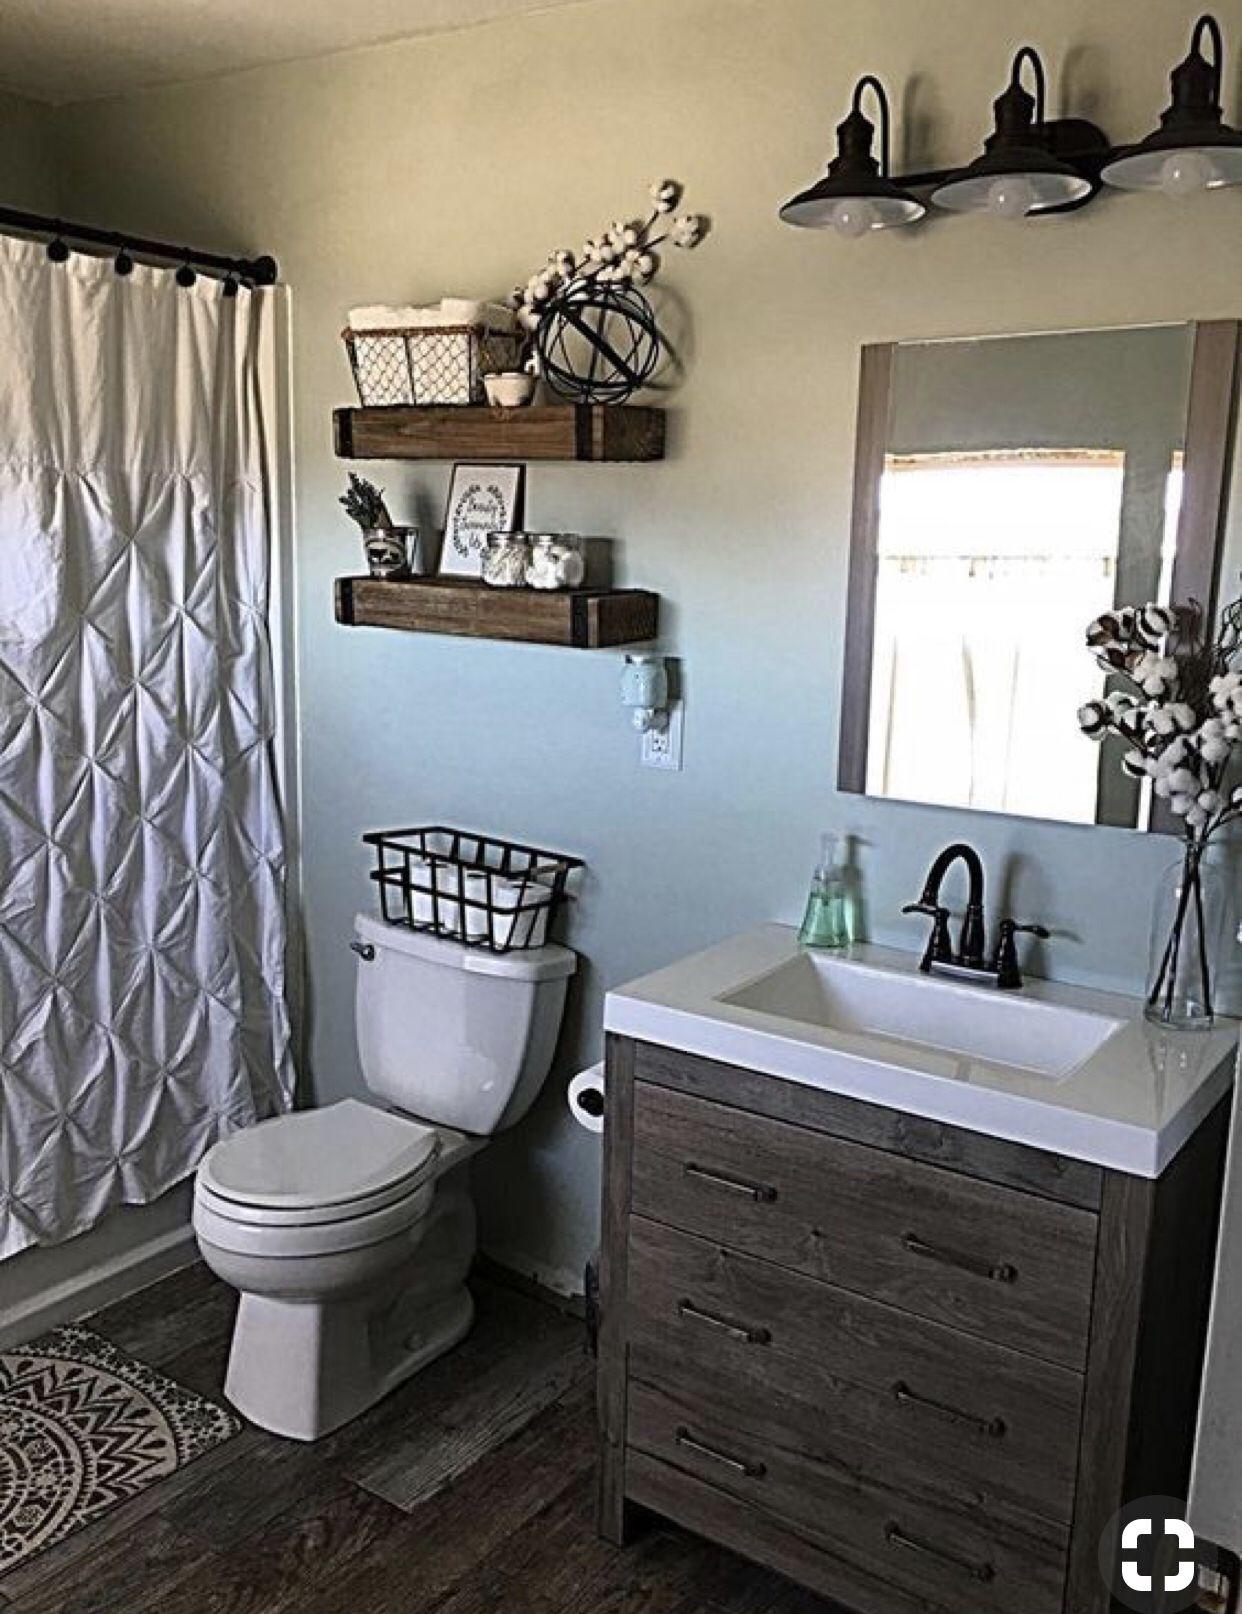 Masterbathroom Bathroom Makeovers On A Budget Small Master